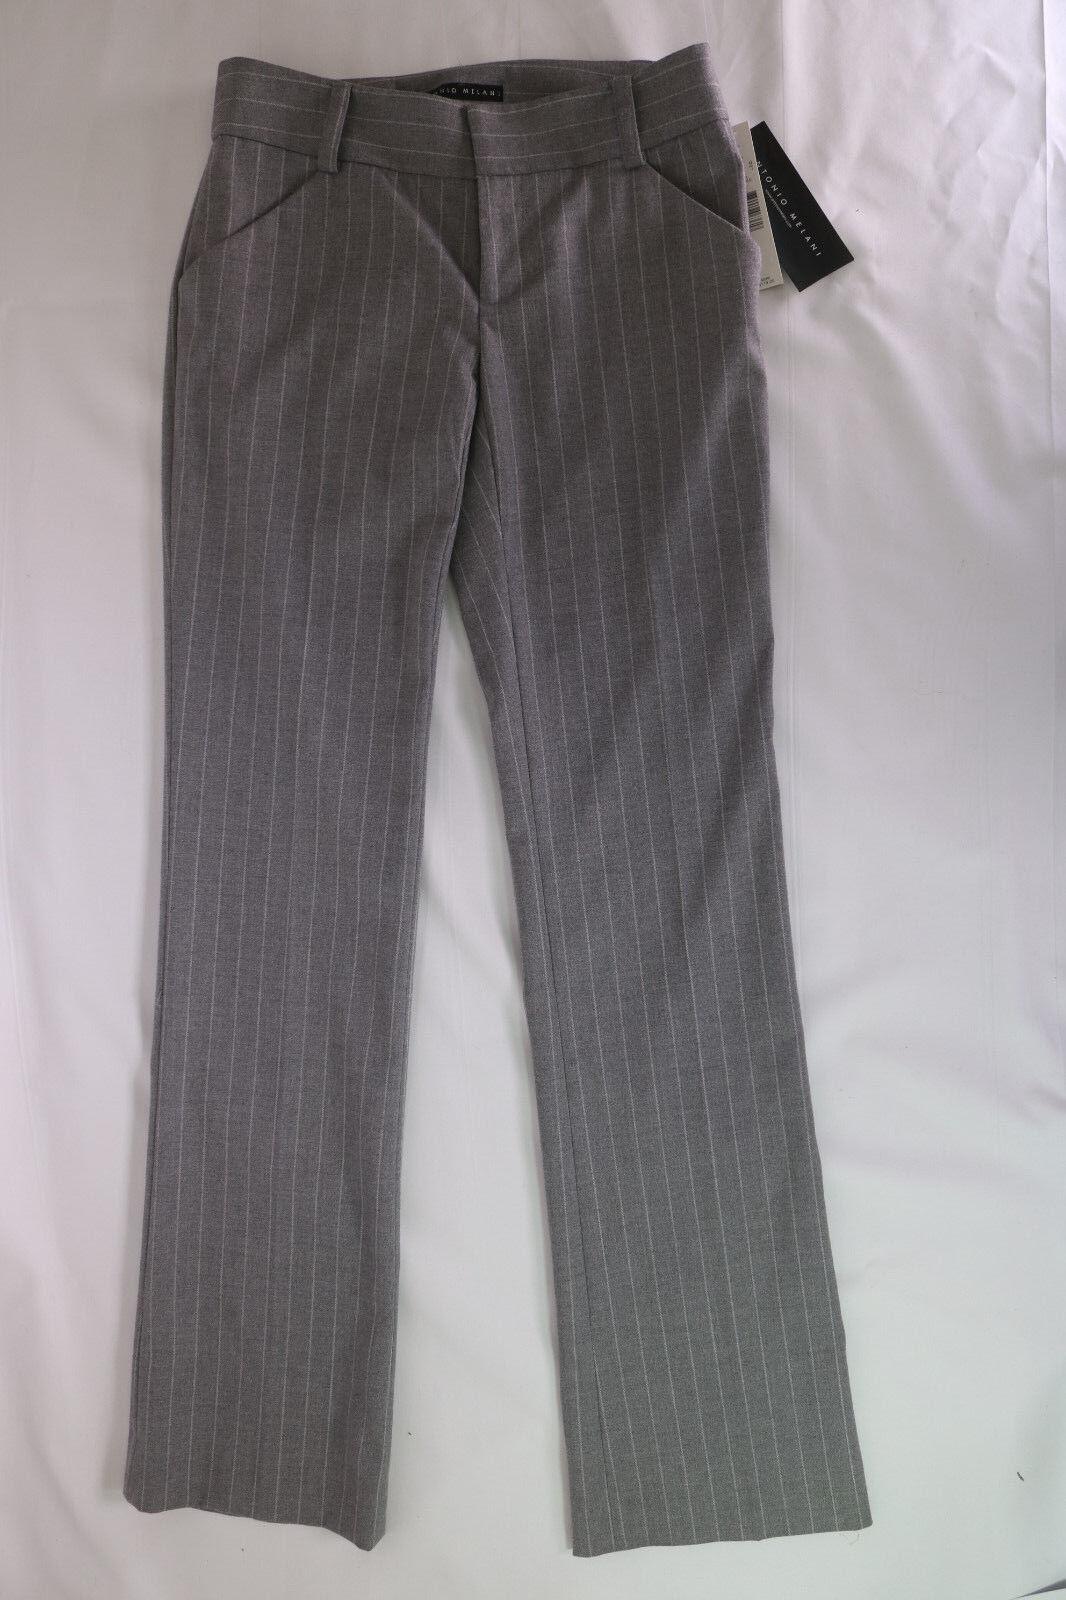 Antonio Melani Coco Pants Striped Charcoal Fit amd Flare Leg Size 0 New NWT  119